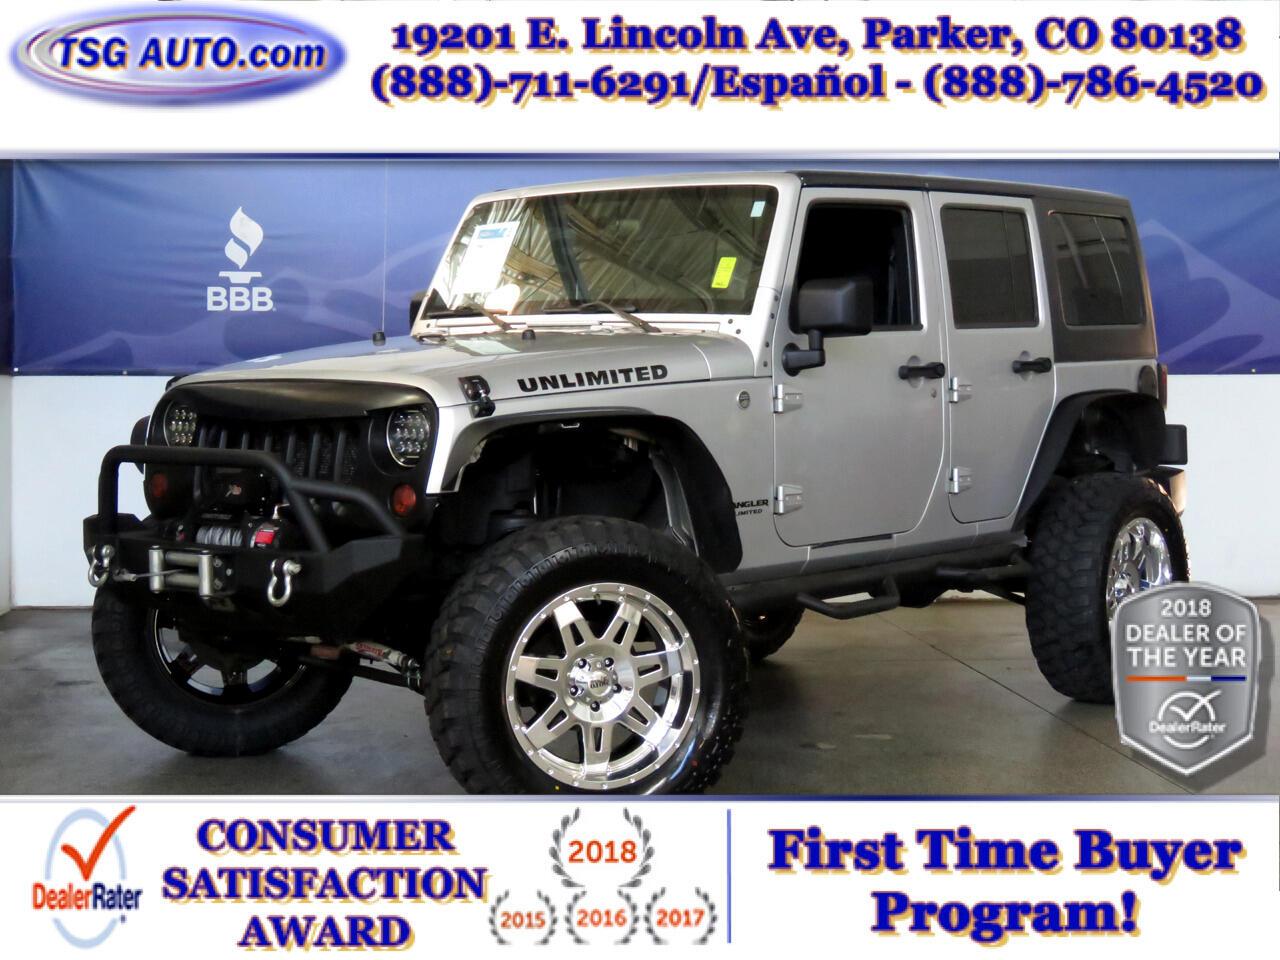 2009 Jeep Wrangler Unlimited 4WD X W/Custom Lift/Tires/Wheels/Winch/Bumper